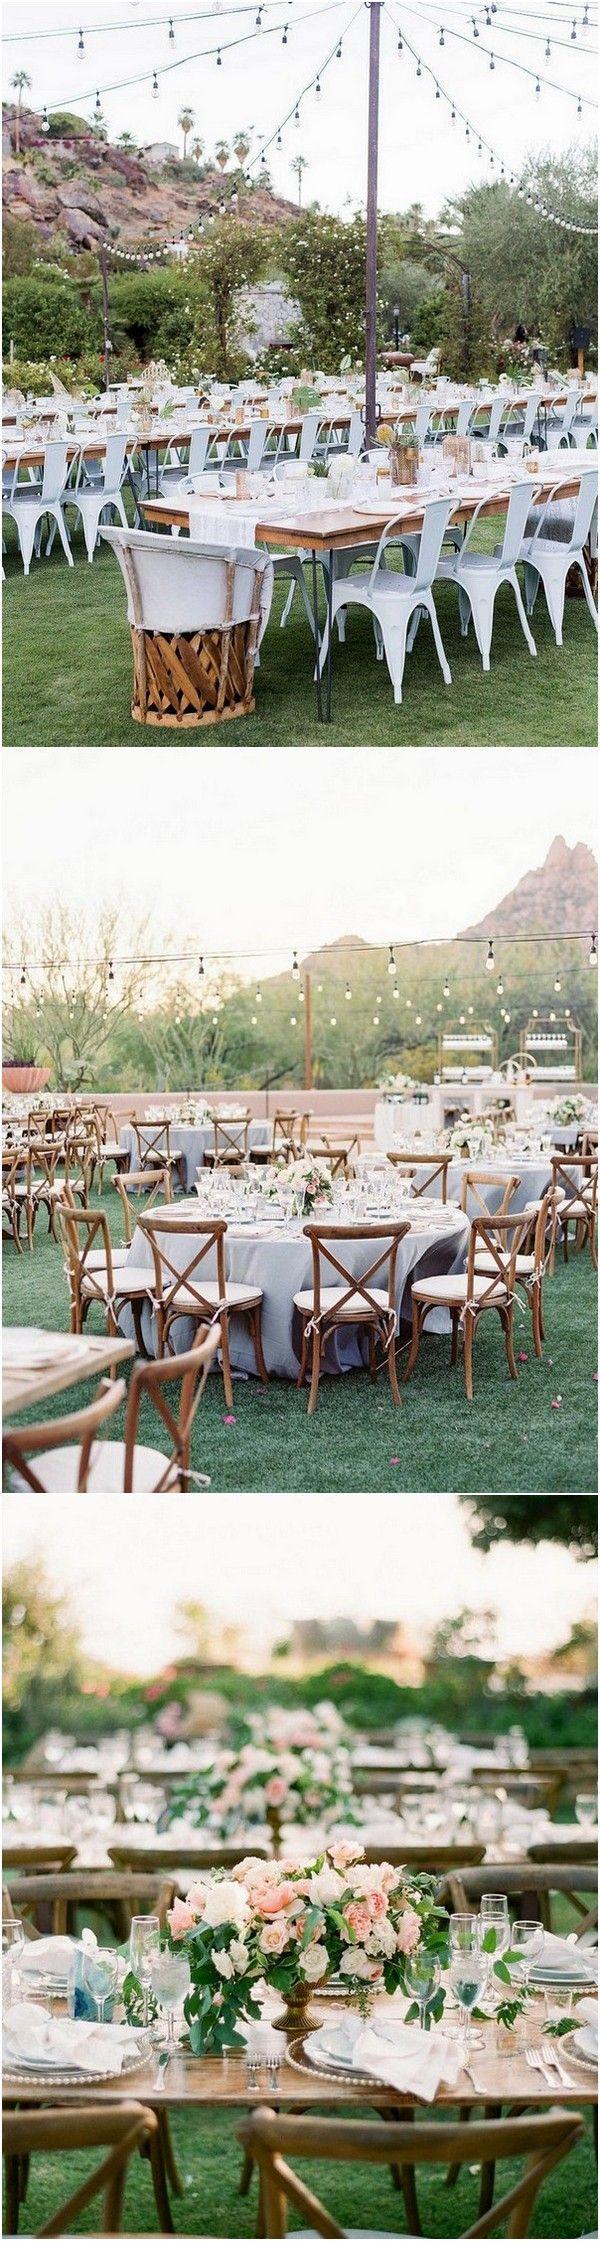 Wedding venue decoration ideas   Trending Wedding Venue Decoration Ideas for Your Reception